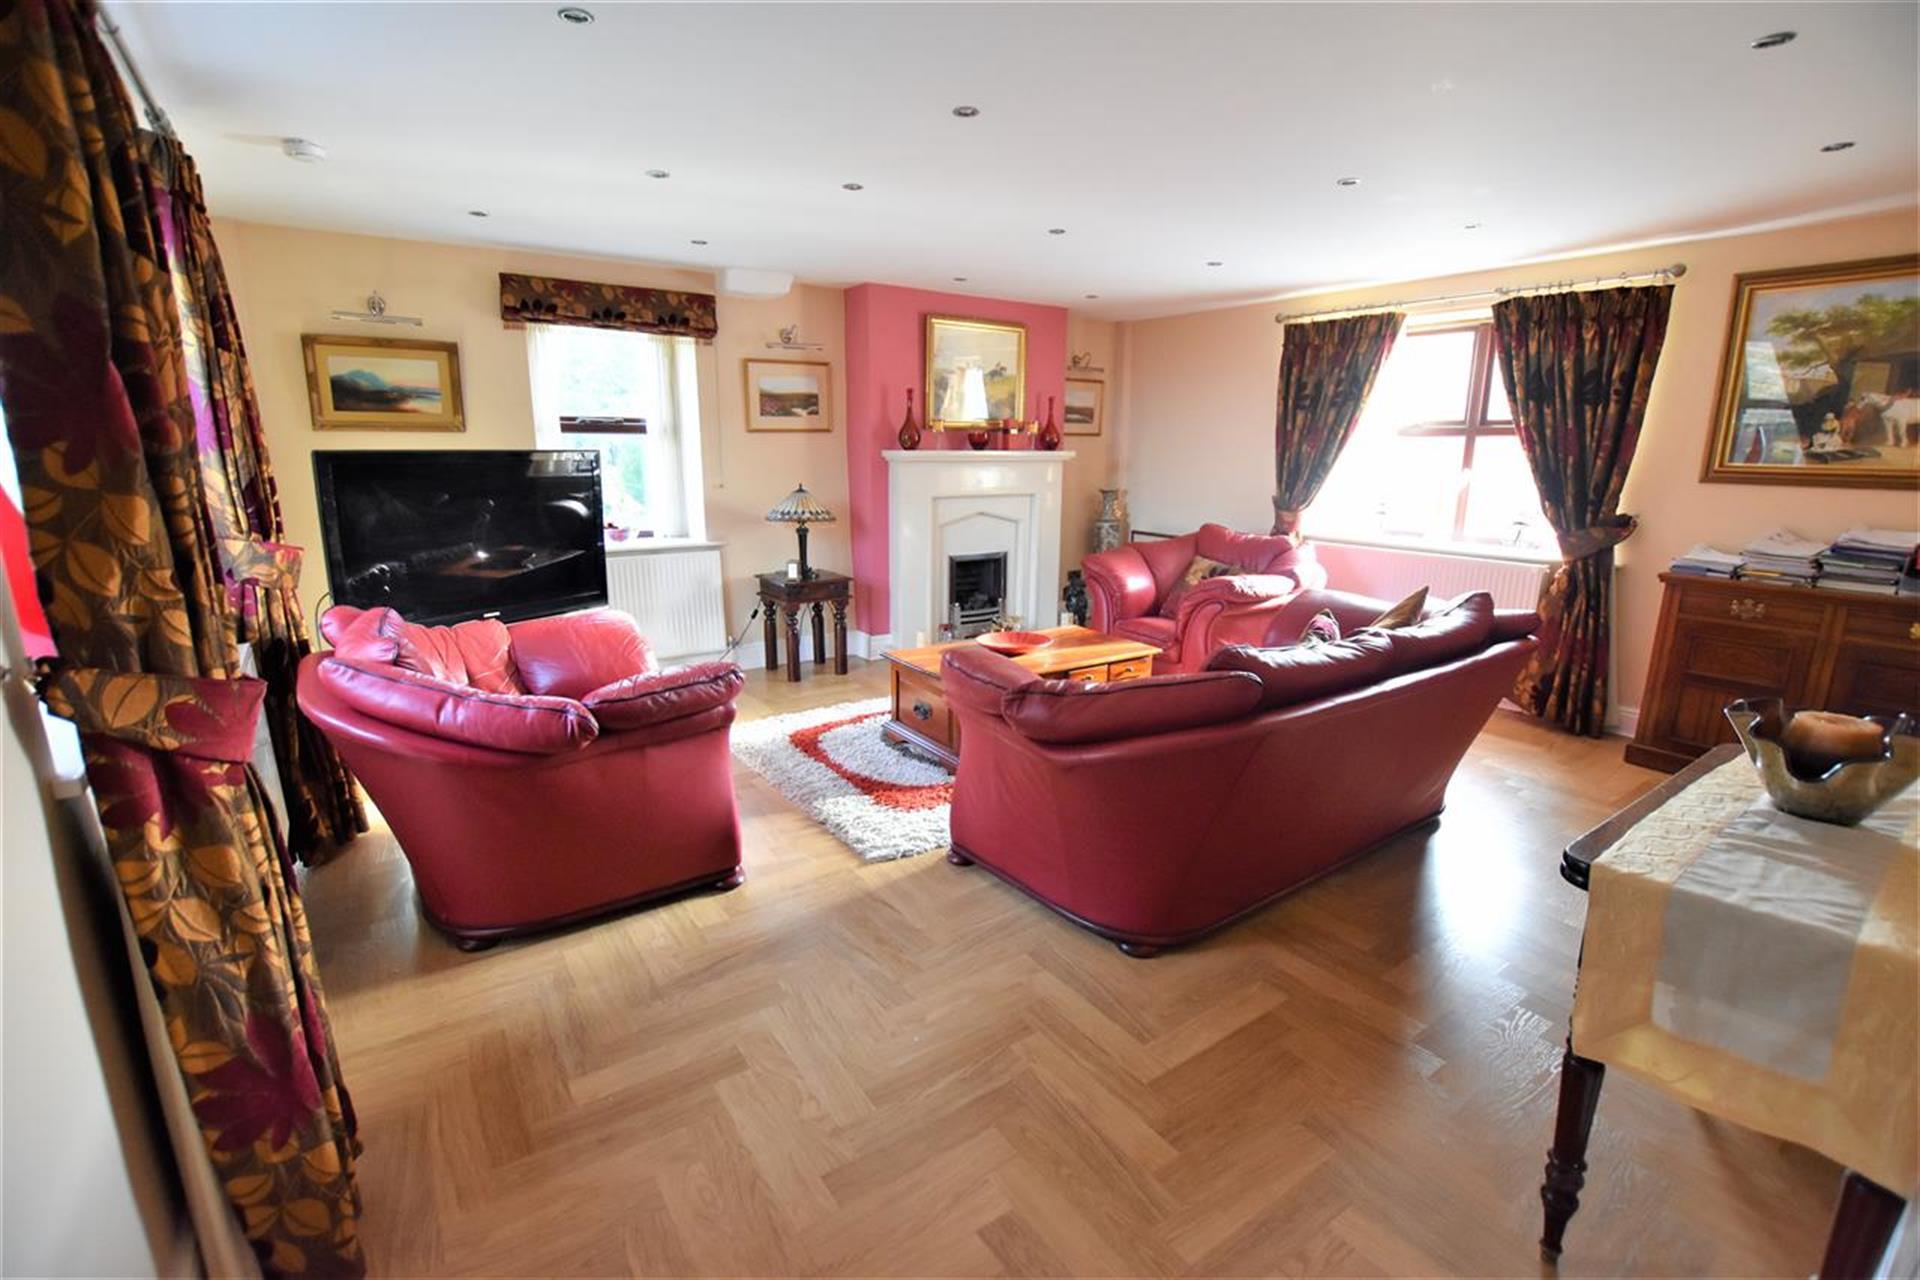 4 Bedroom Detached House For Sale - Reception Room 1